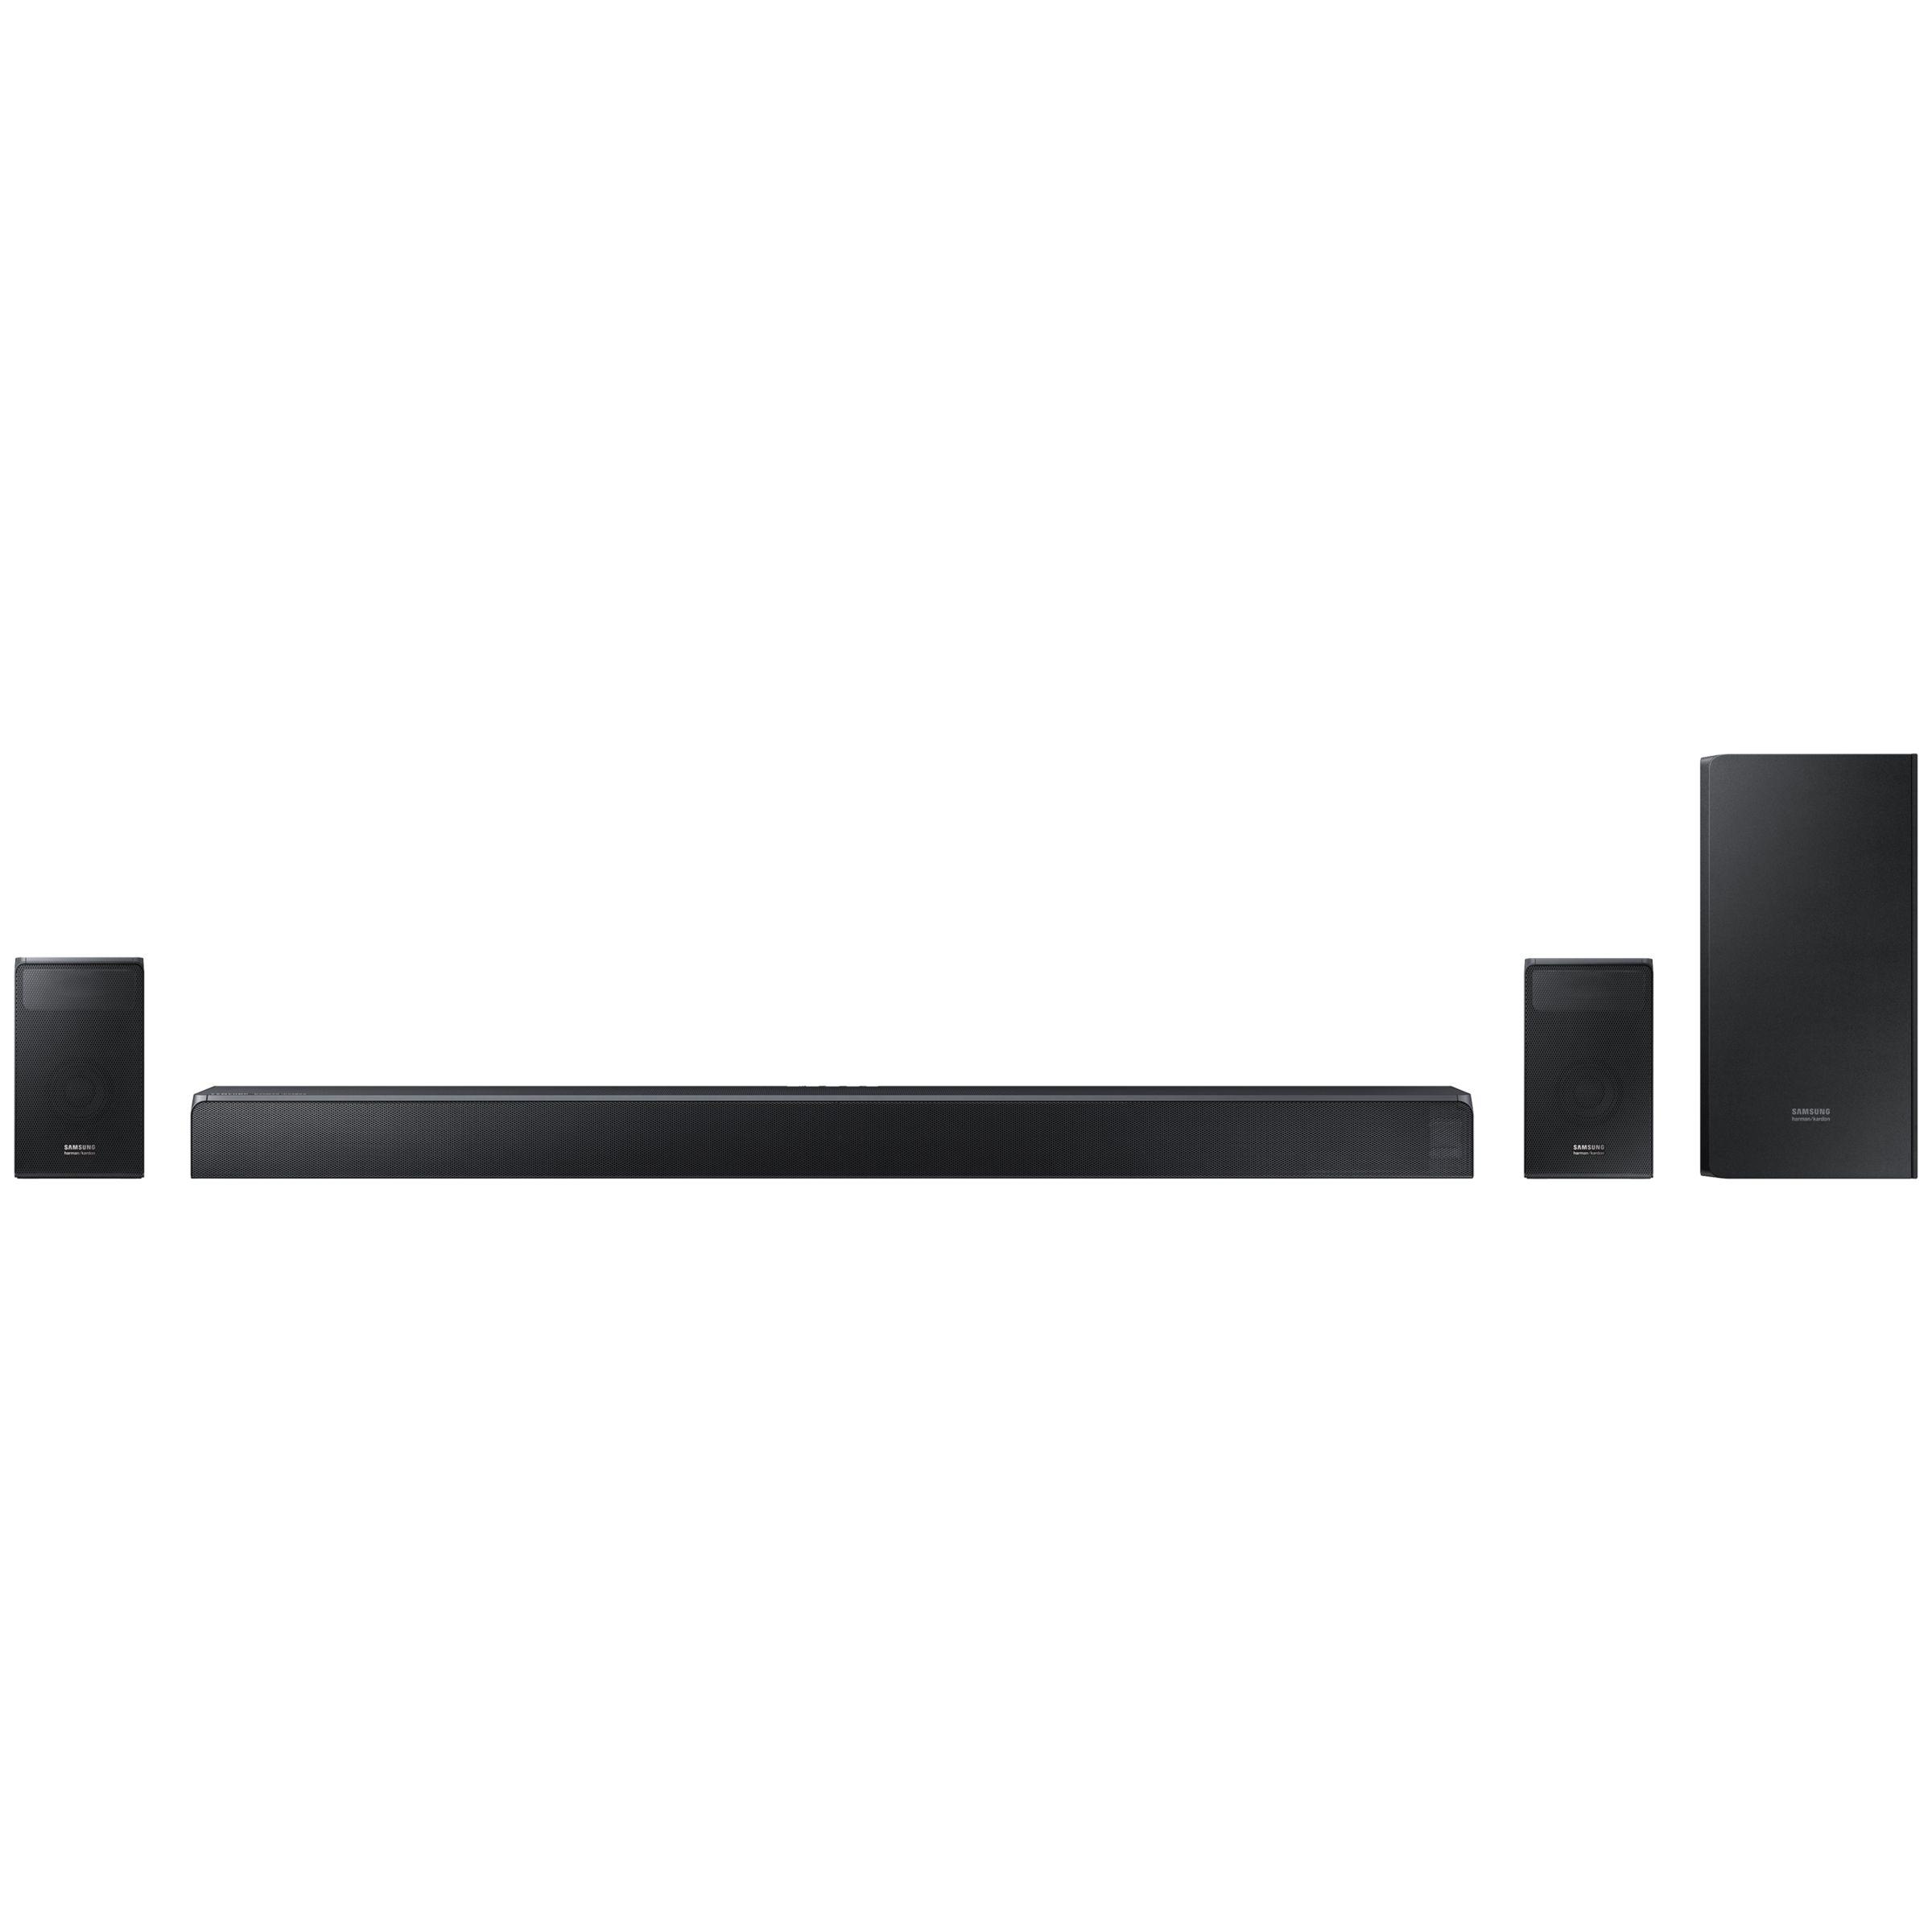 Samsung harman/kardon HW-N950 Bluetooth Wi-Fi Sound Bar with Dolby Atmos,  Wireless Subwoofer & Rear Speakers